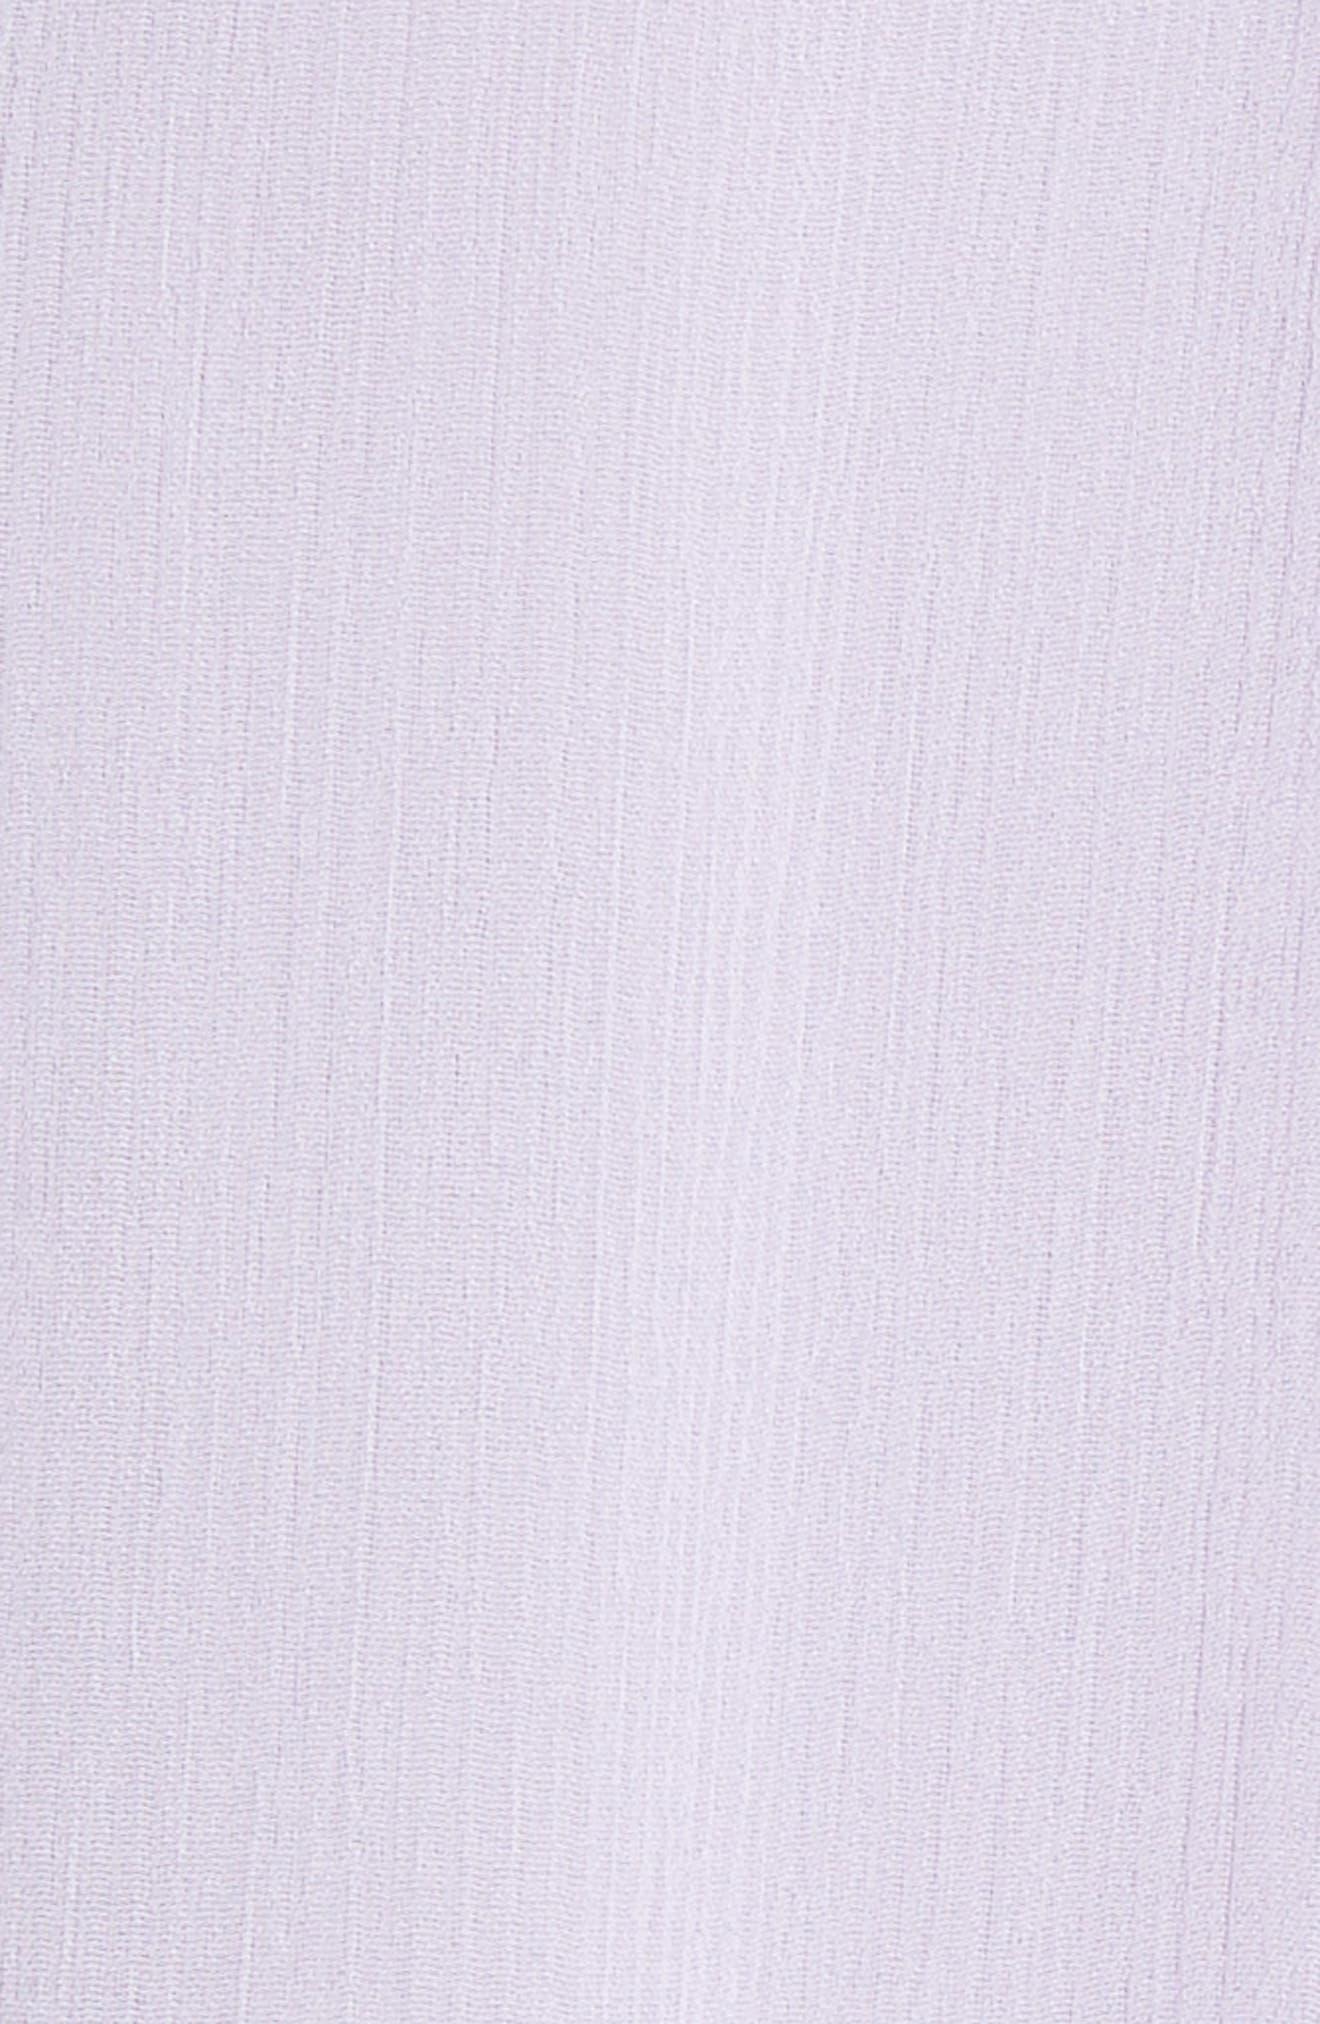 Maris Tie Back Top,                             Alternate thumbnail 5, color,                             Lilac